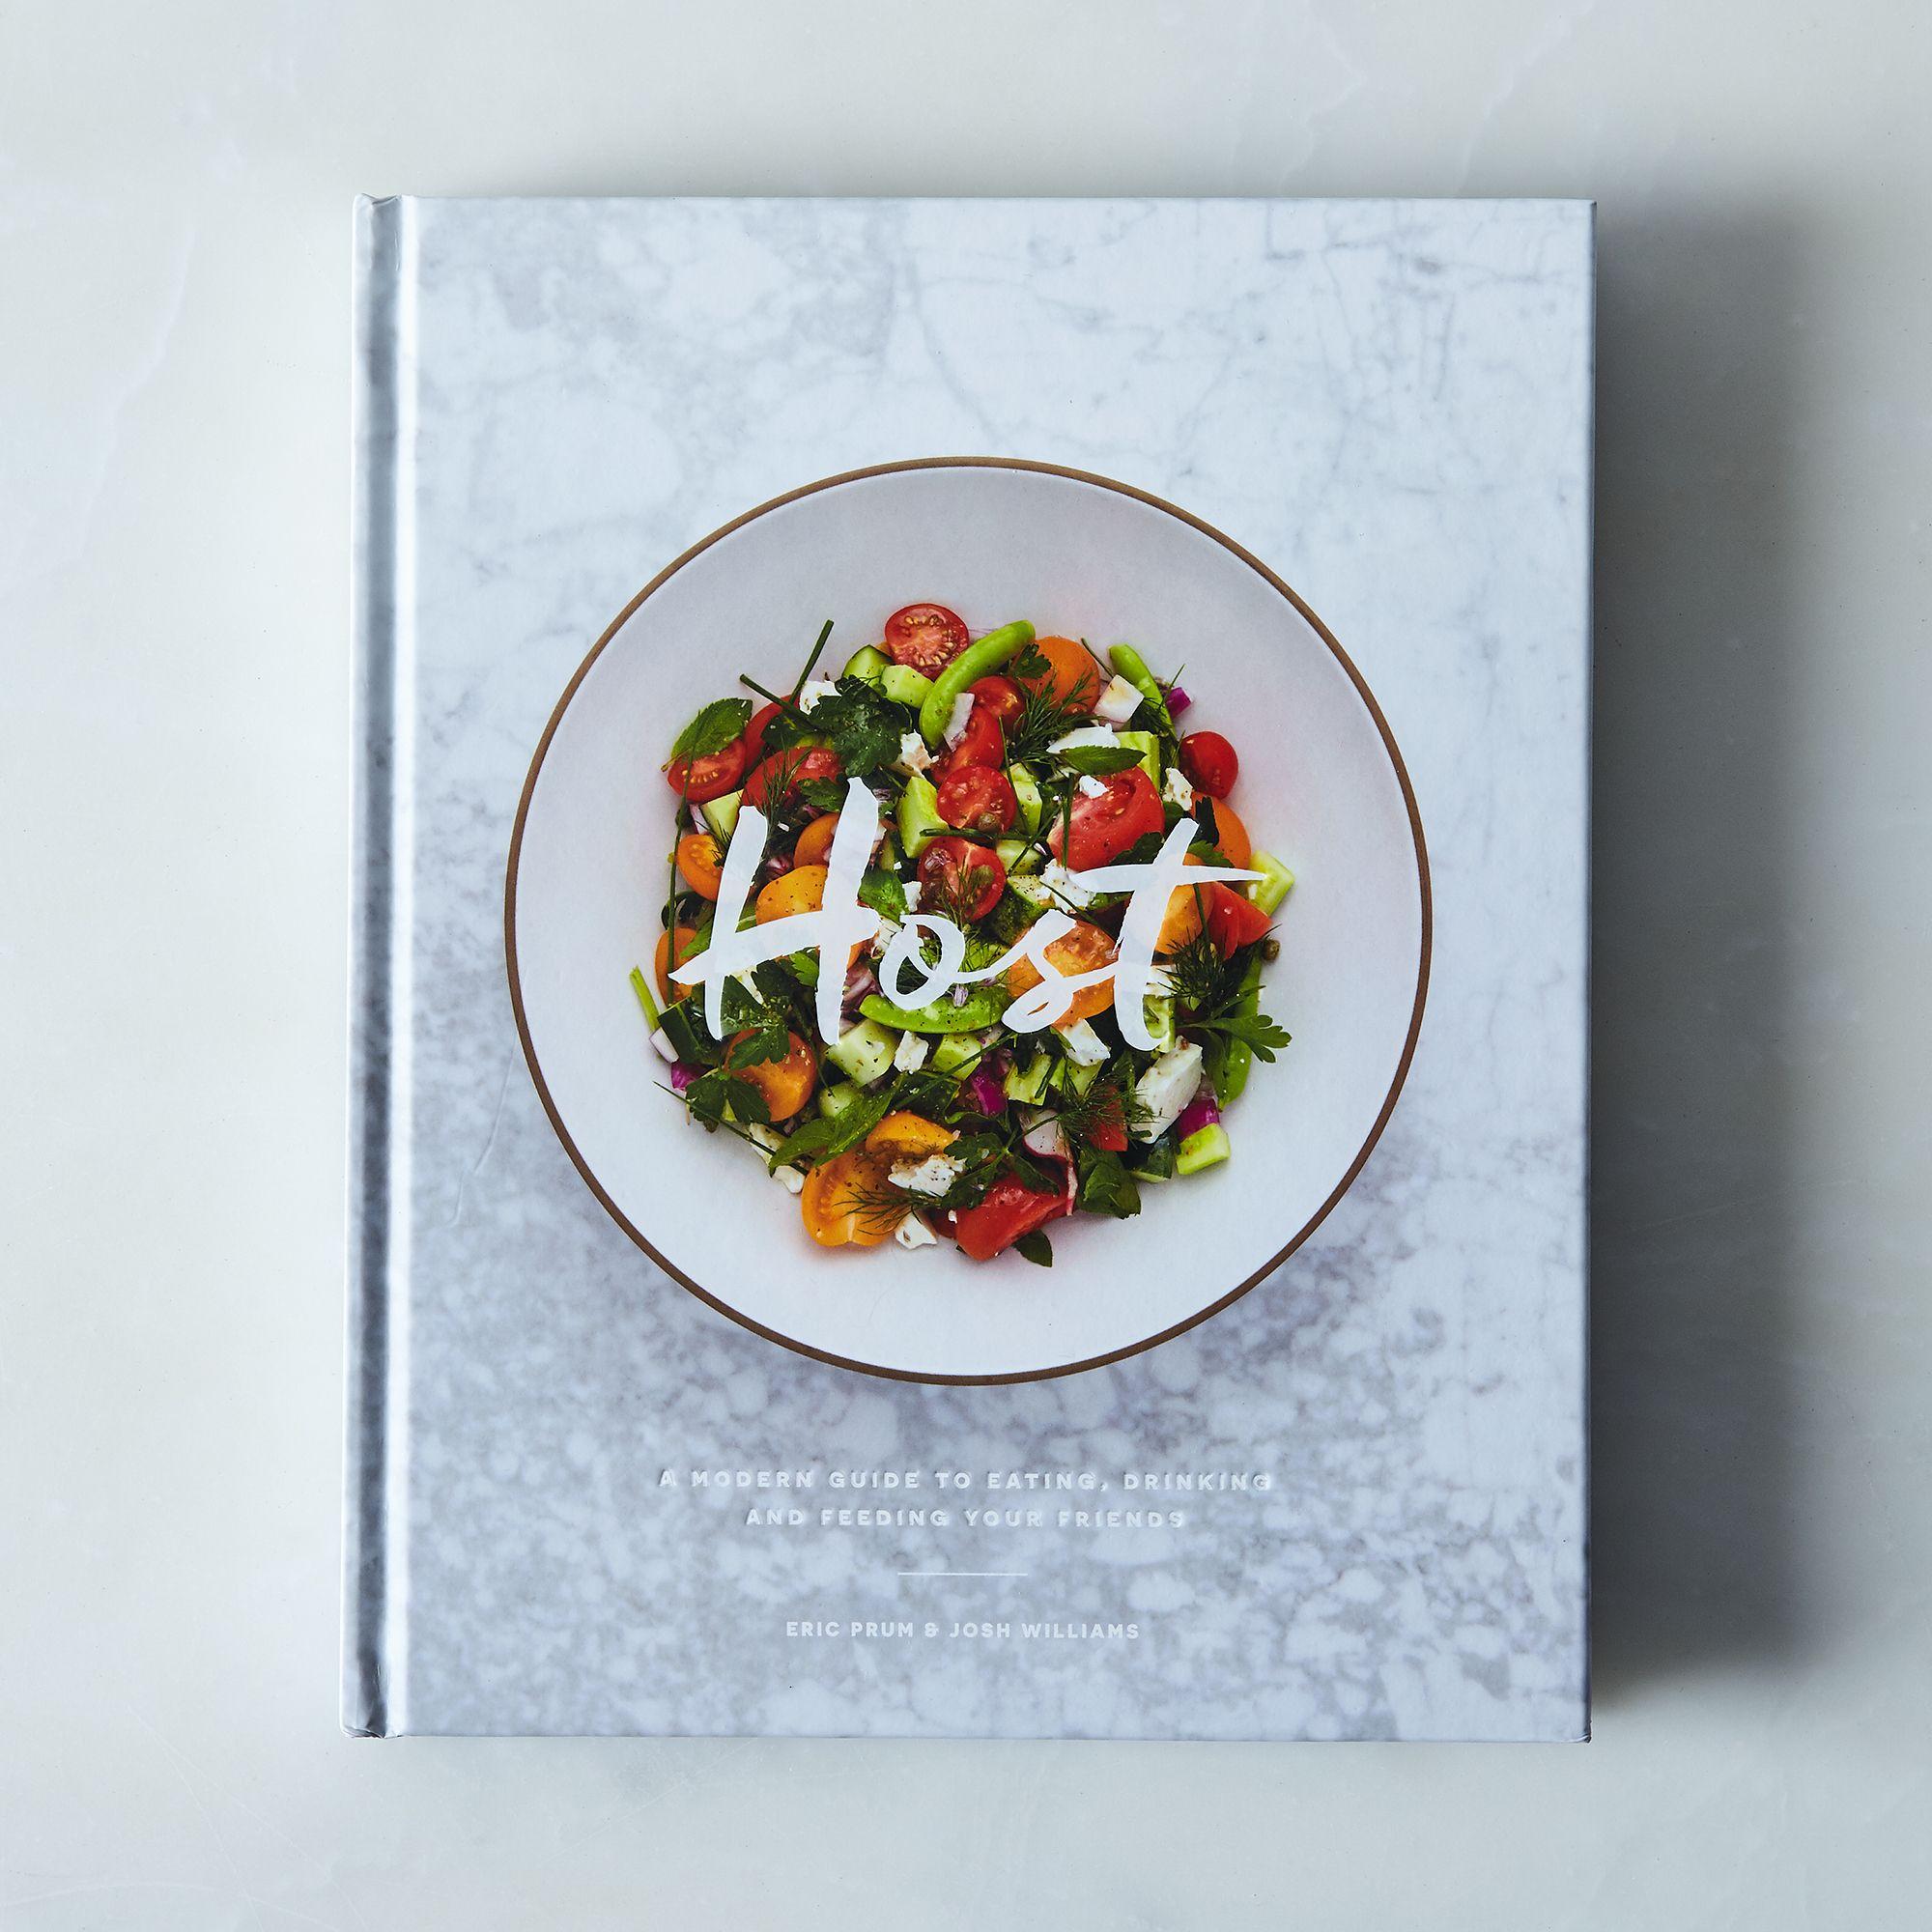 Host Cookbook & Walnut Cutting Board Host Cookbook